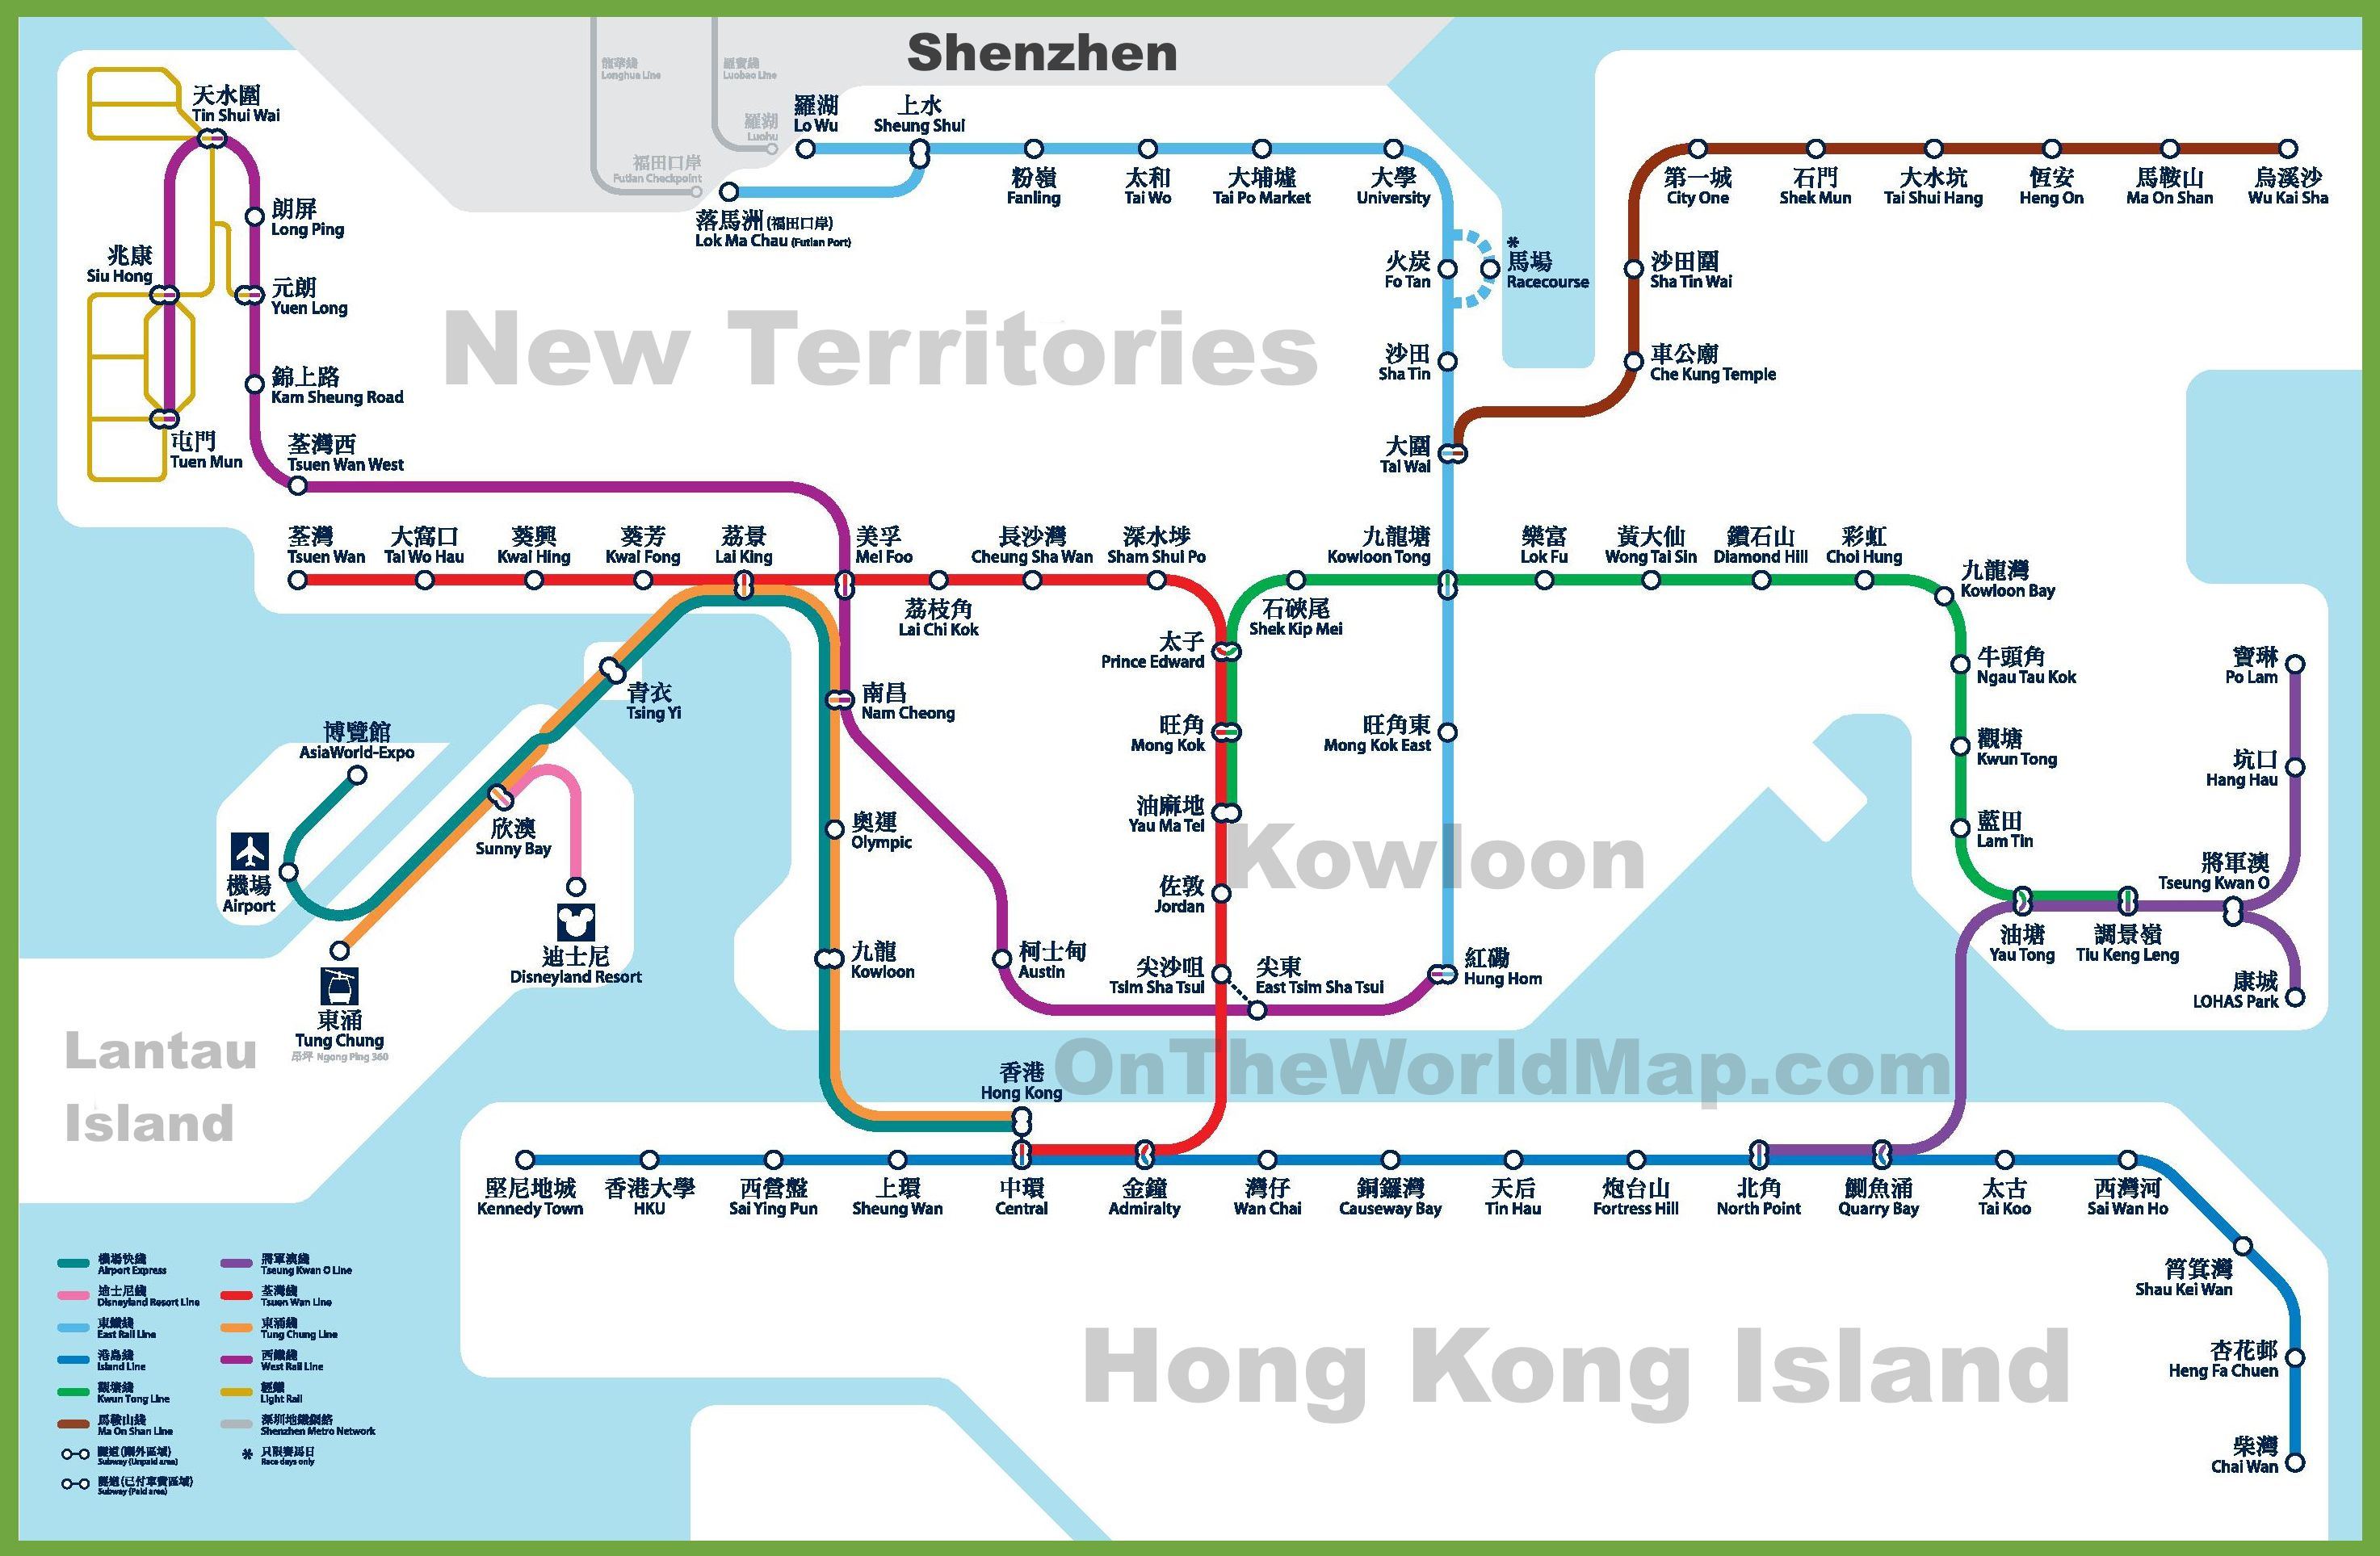 Carte du métro de Hong Kong